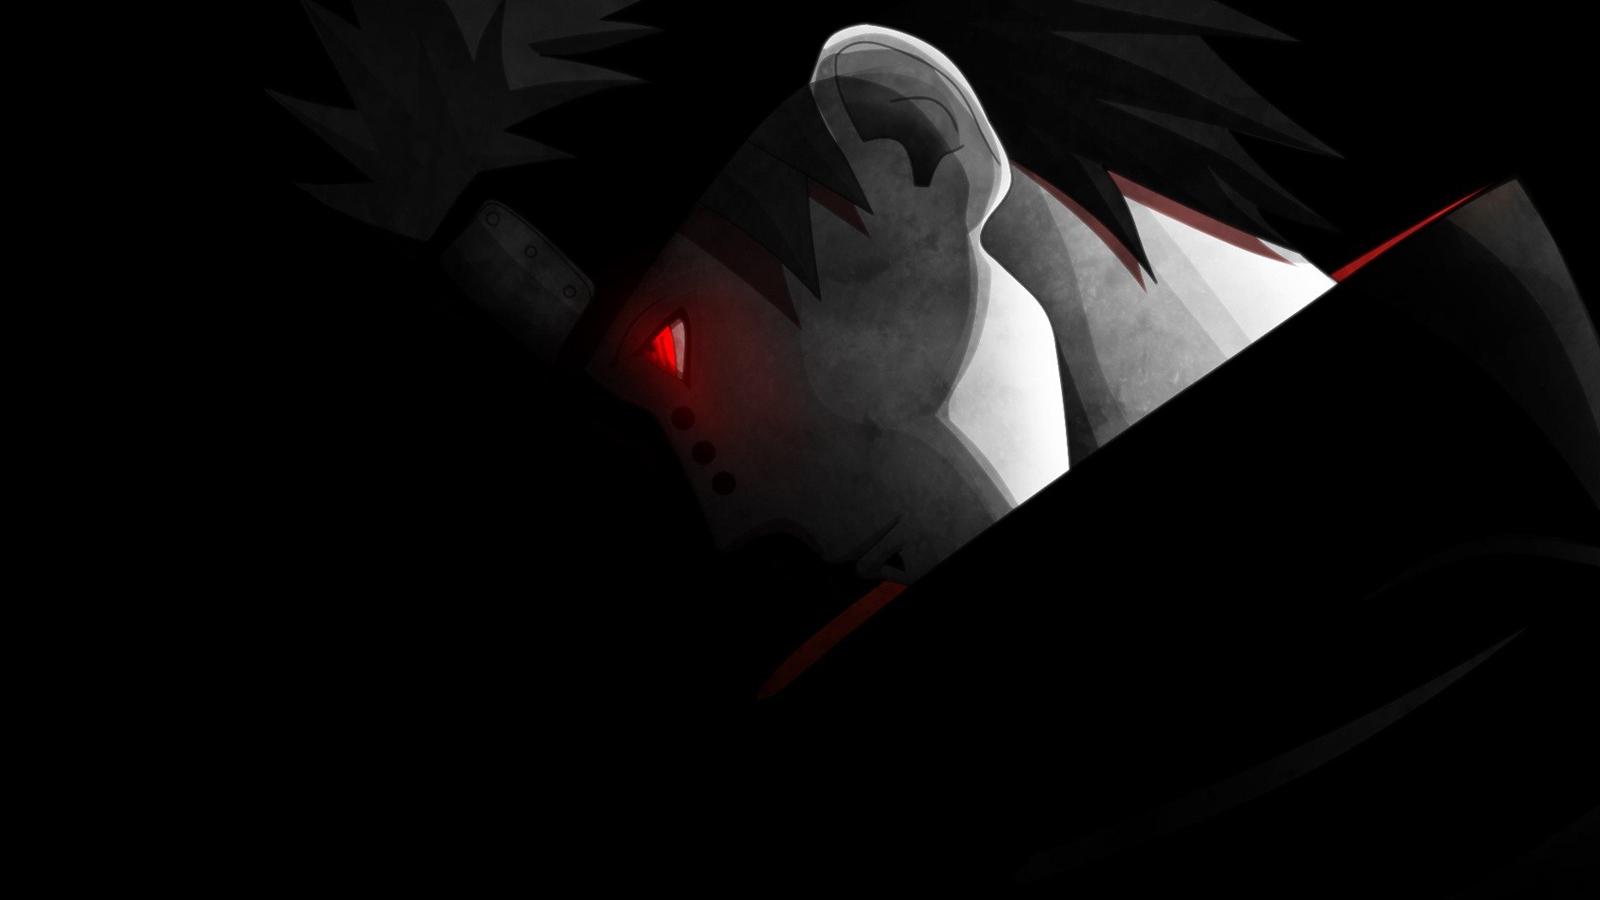 Pain Anime Rinnegan 3b Wallpaper HD 1600x900